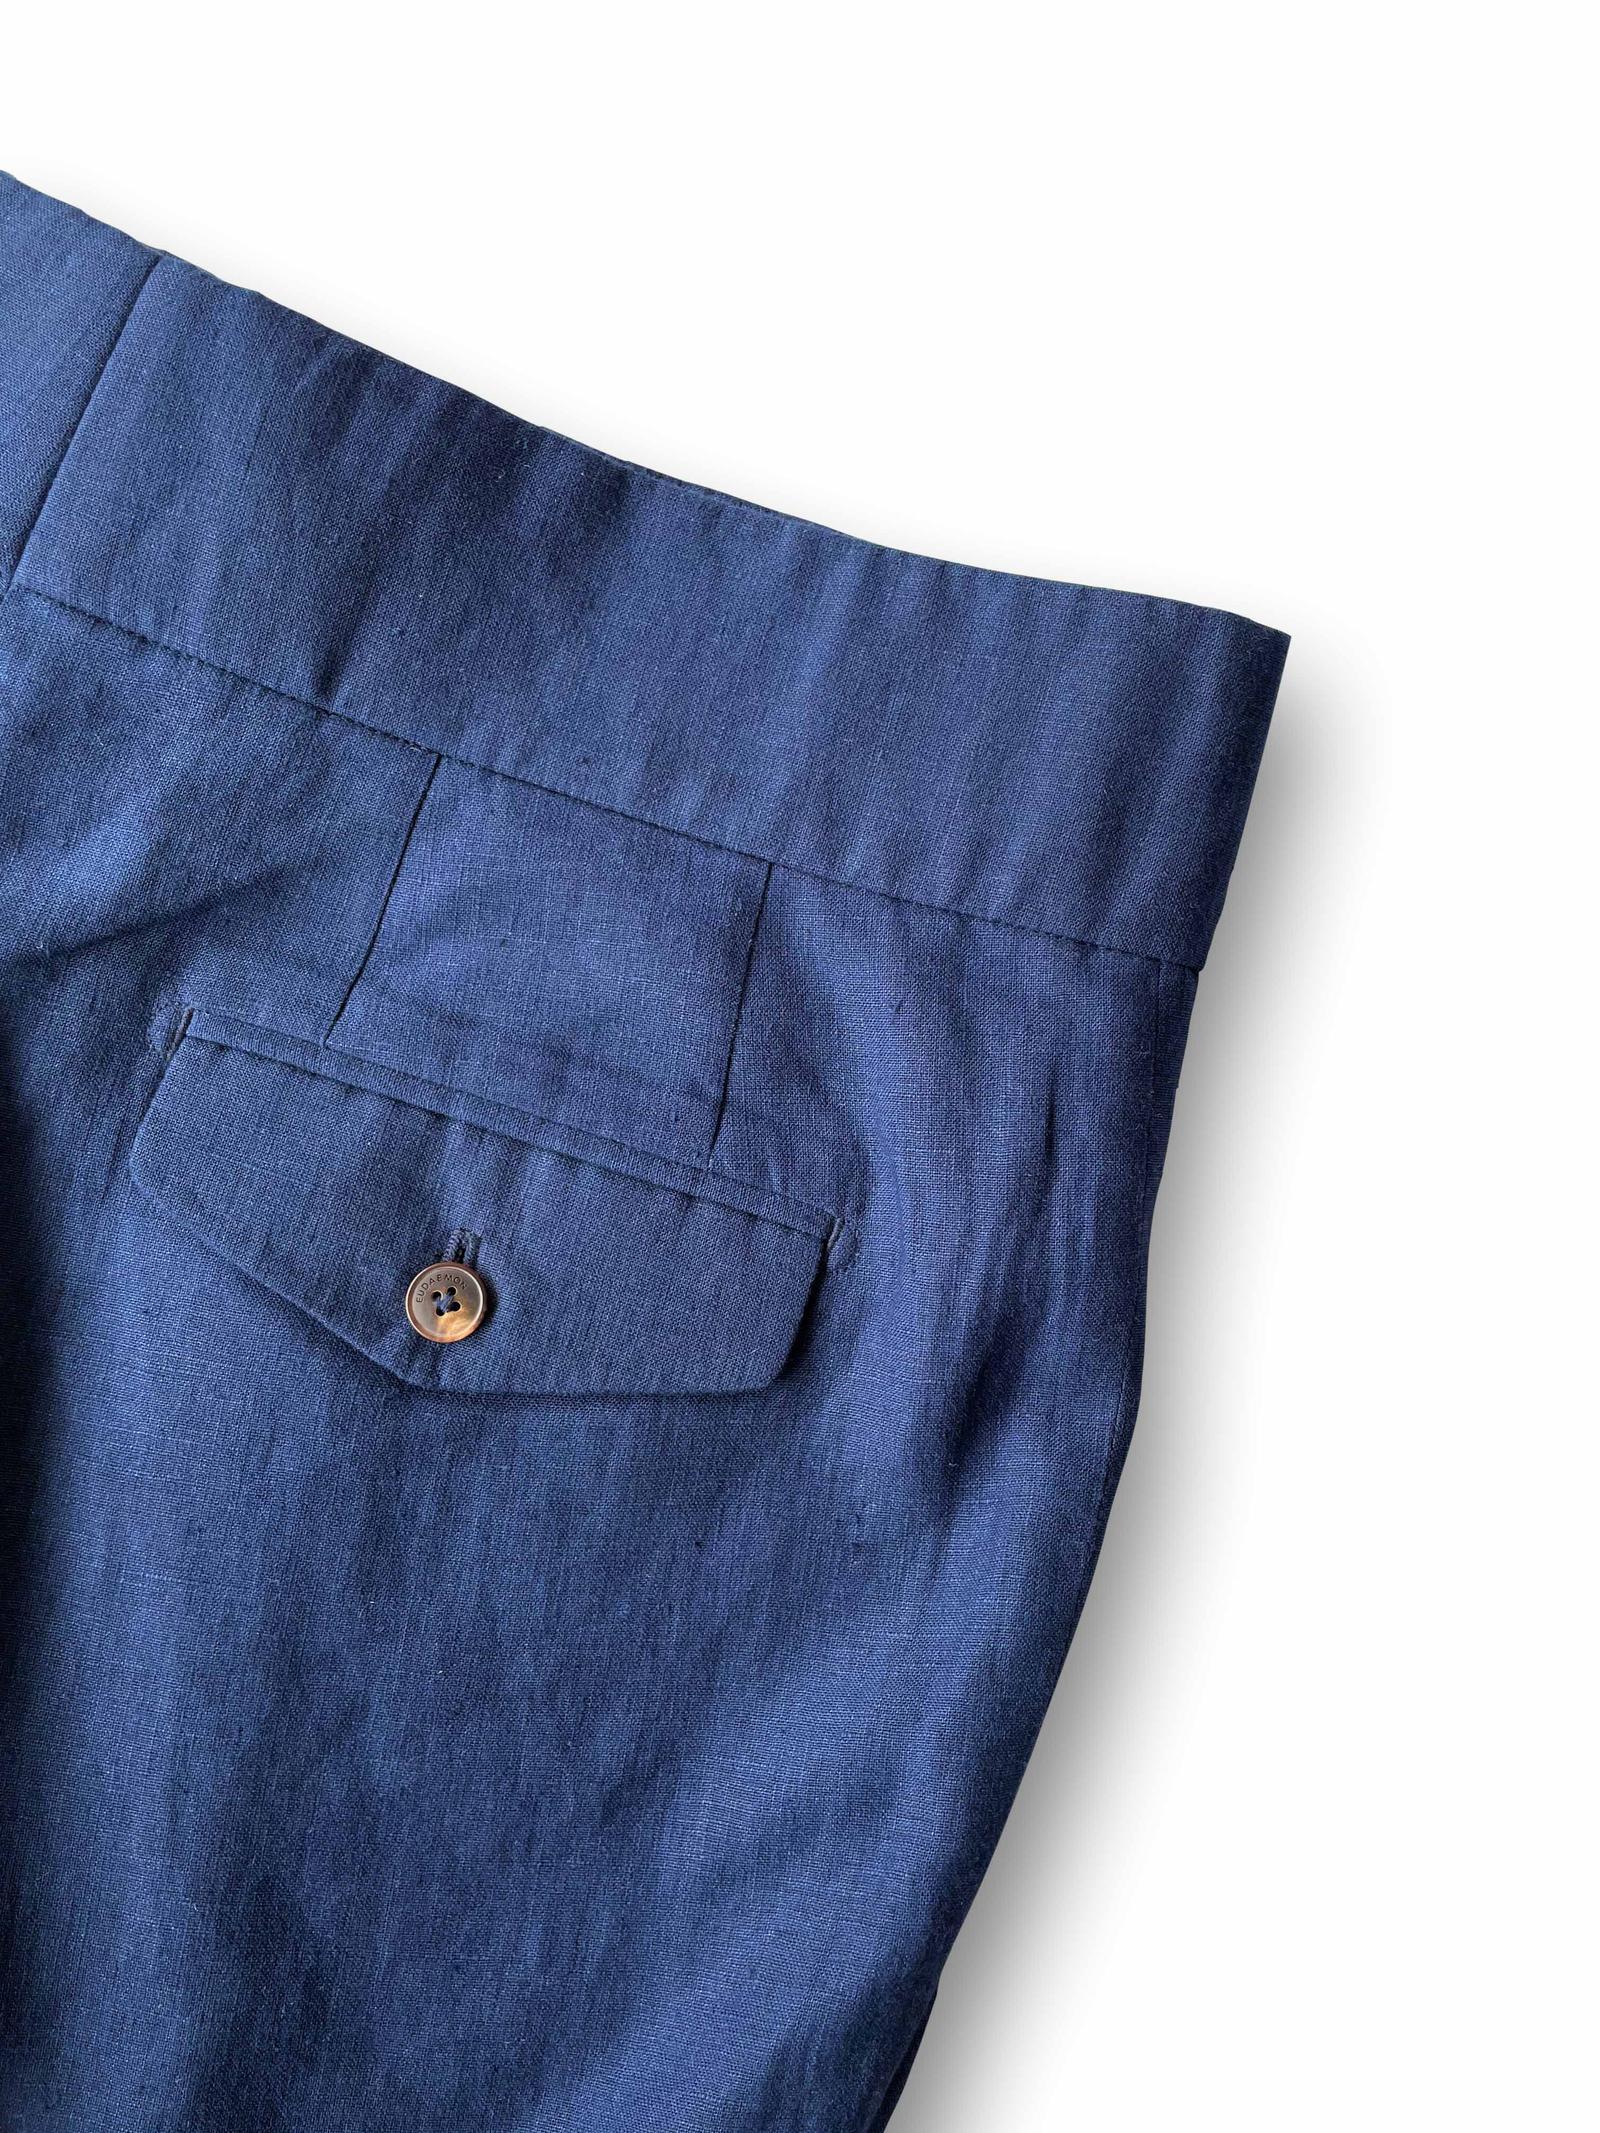 Bahadur Trouser - Royal Blue Linen